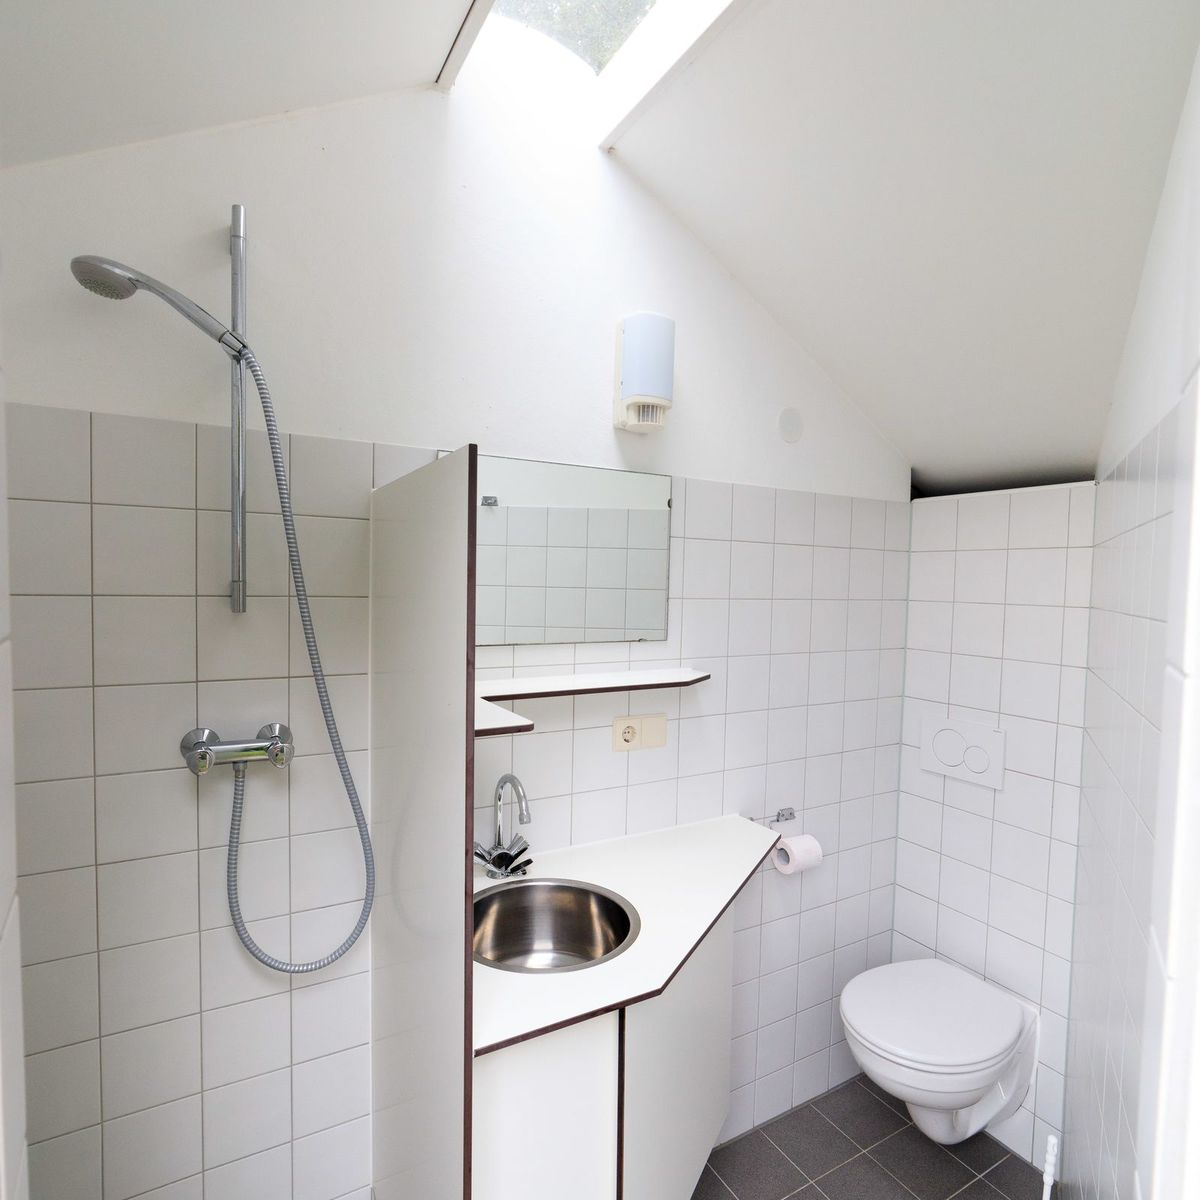 Comfortplaats met privé sanitair